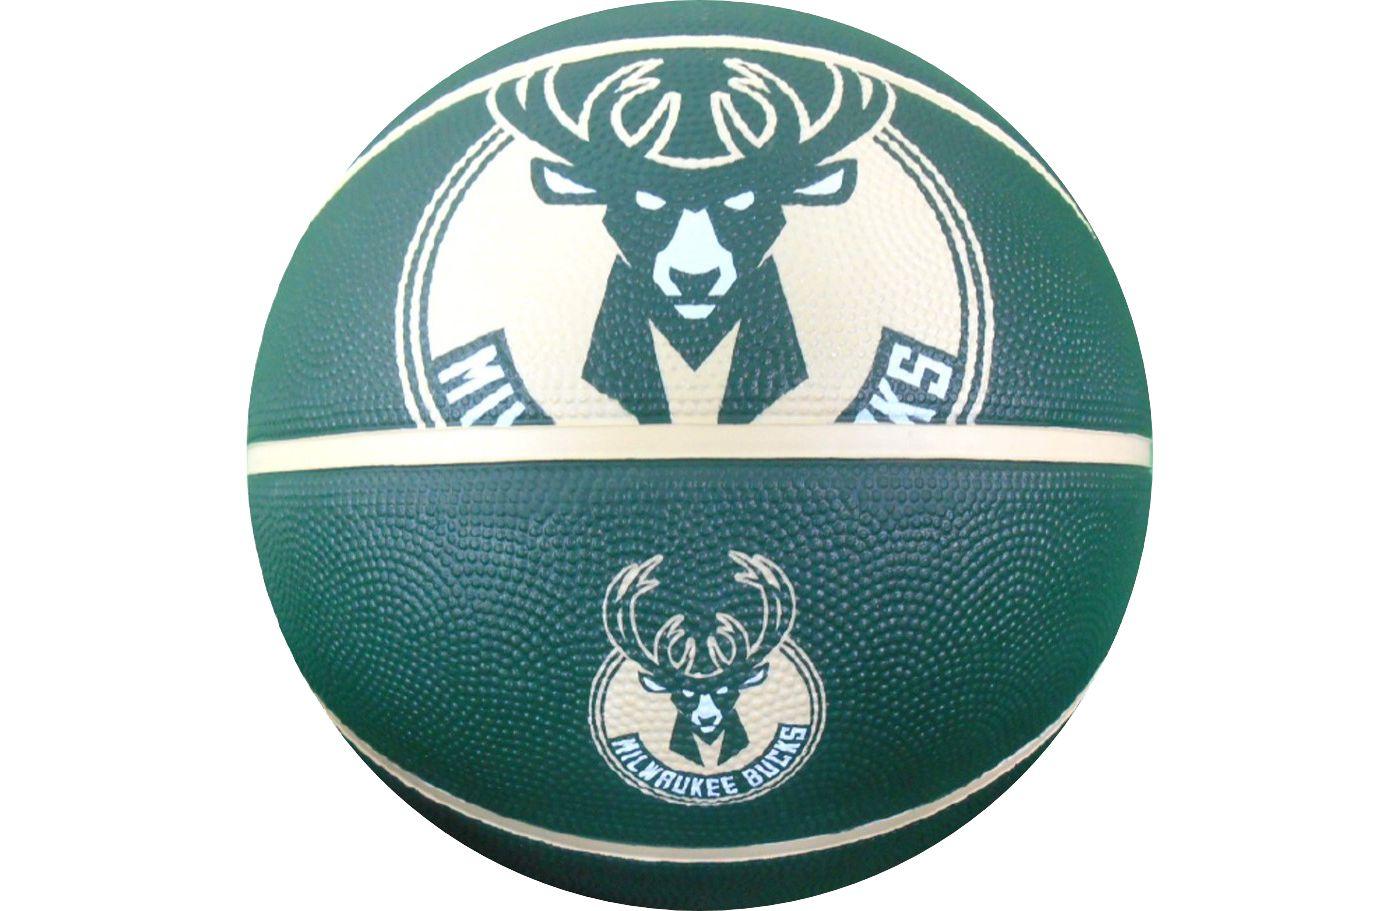 Spalding Milwaukee Bucks Full-Size Basketball